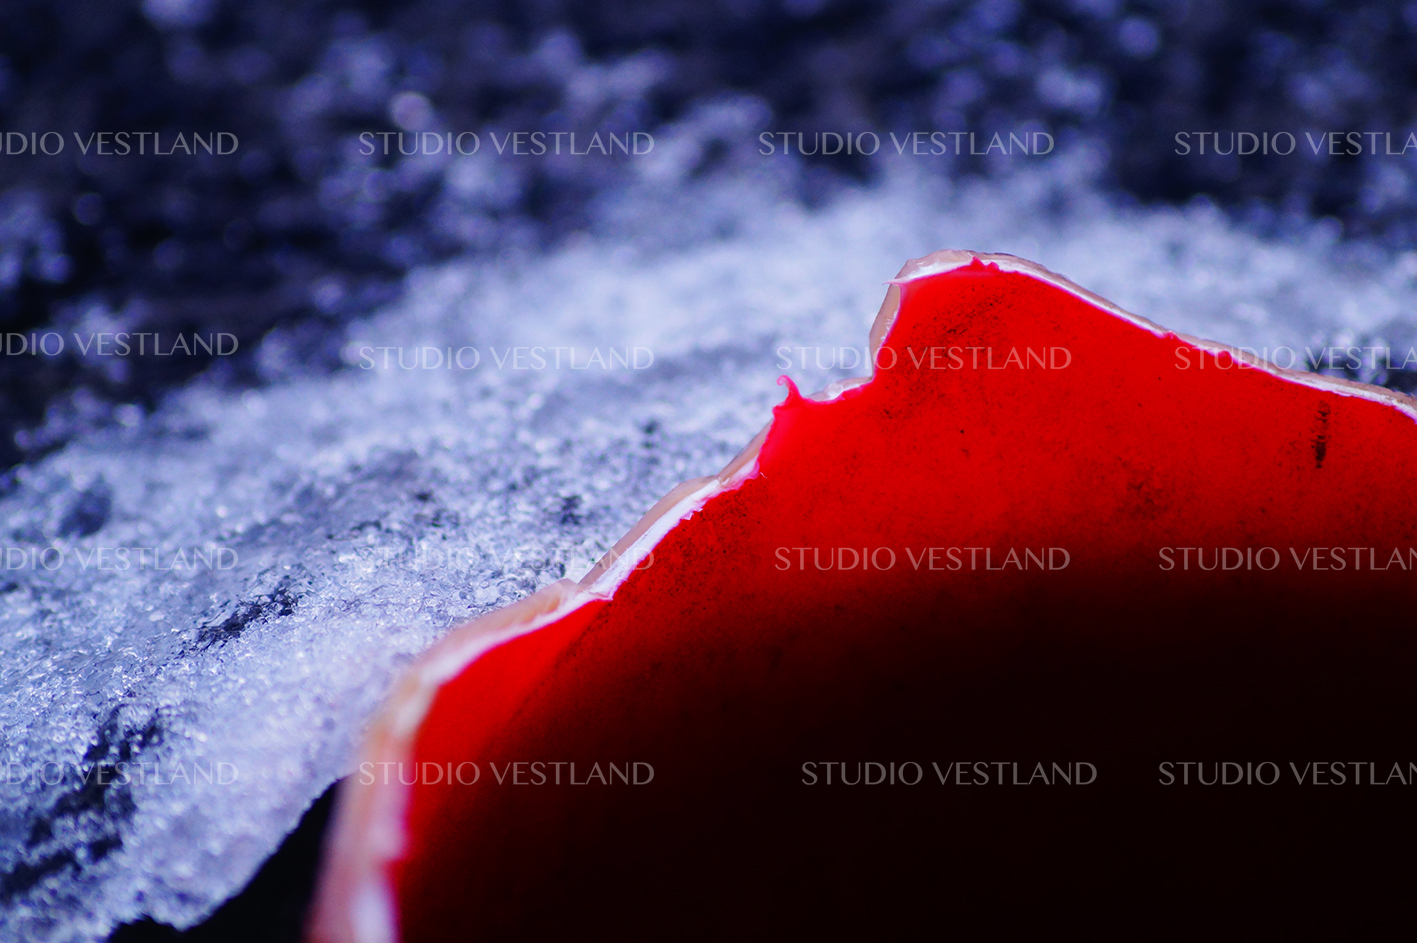 Studio Vestland - Iskant